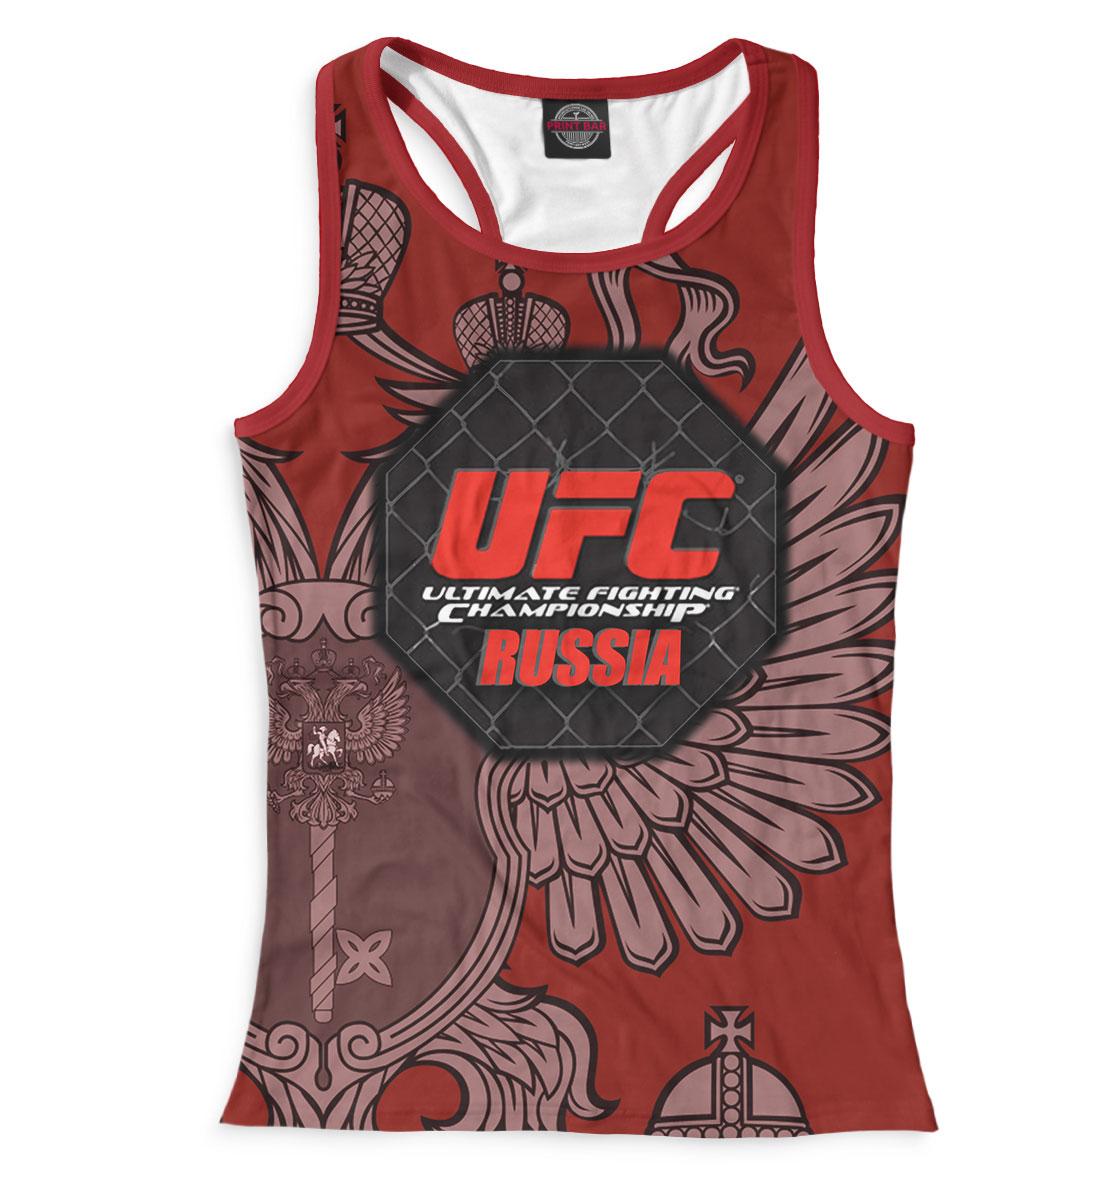 Купить UFC Russia, Printbar, Майки борцовки, MNU-890729-mayb-1